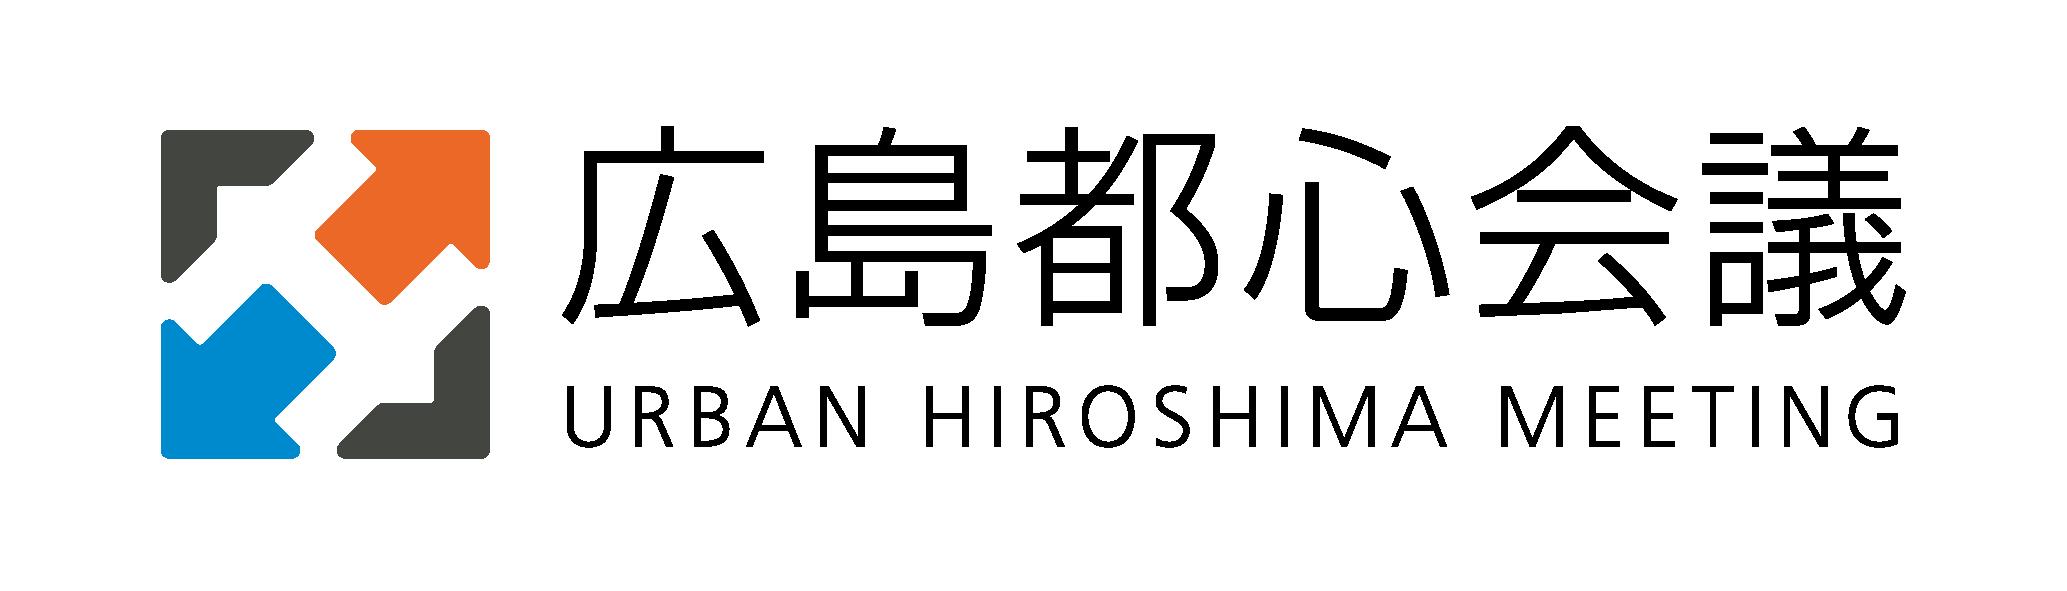 広島都心会議 Urban Hiroshima Meeting